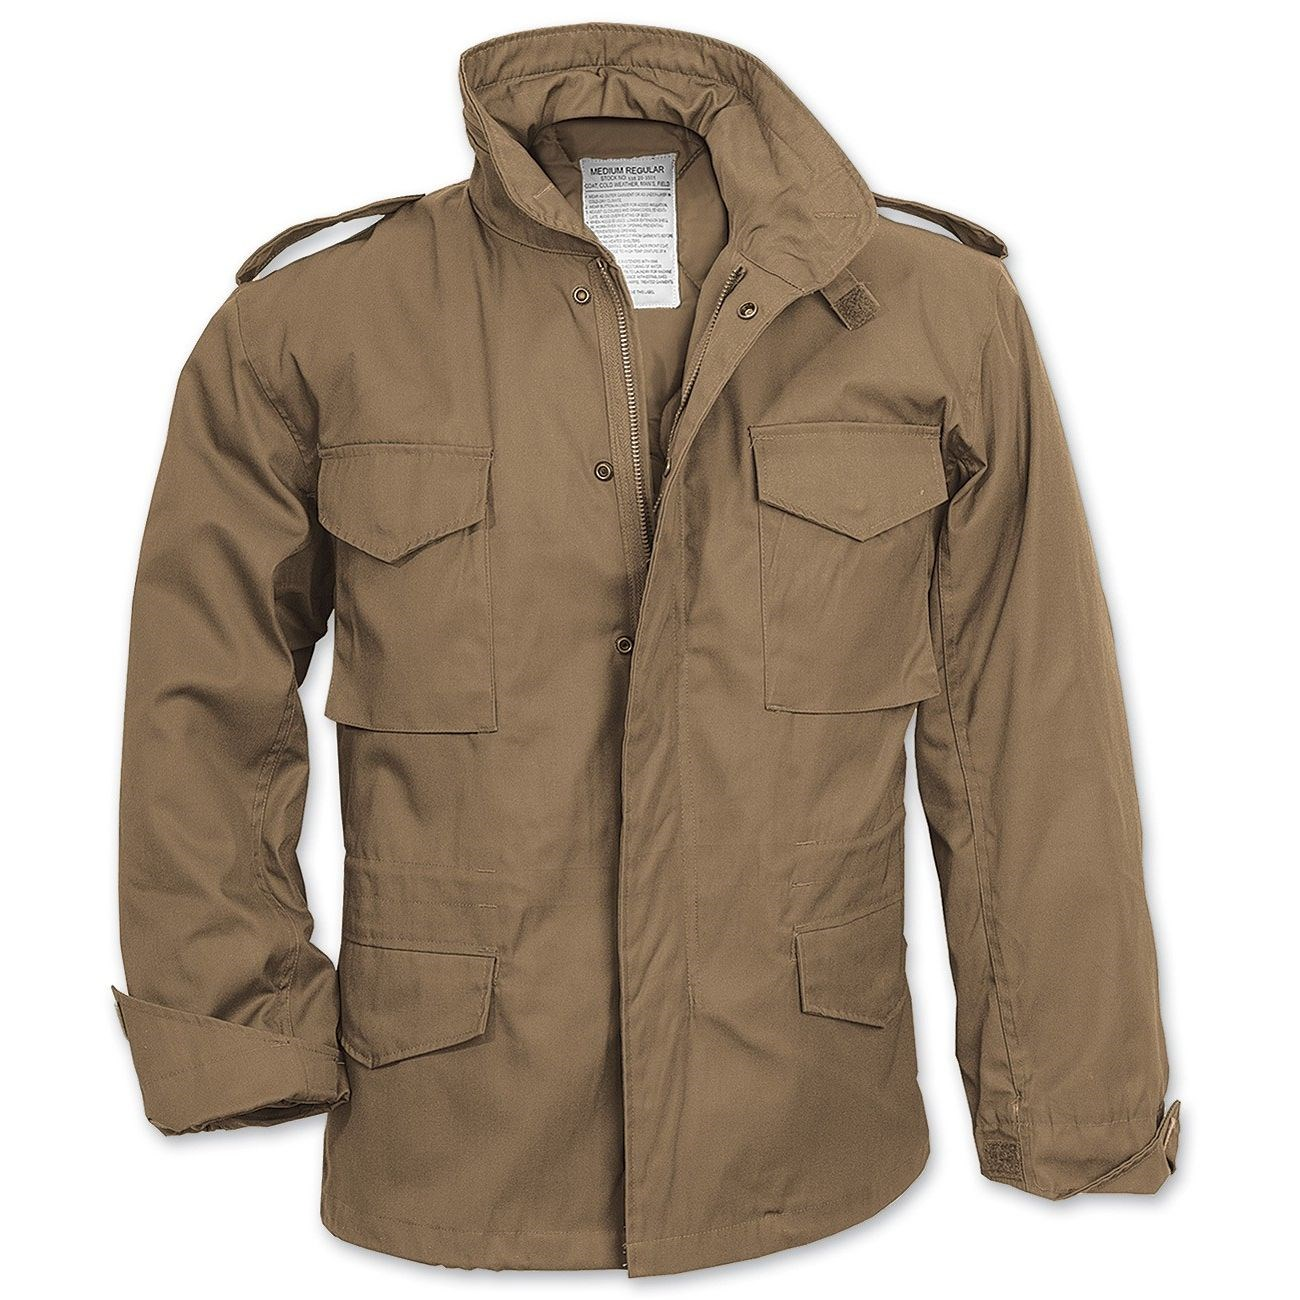 U.S. M65 Jacket DESERT SURPLUS 20-3501-14 L-11